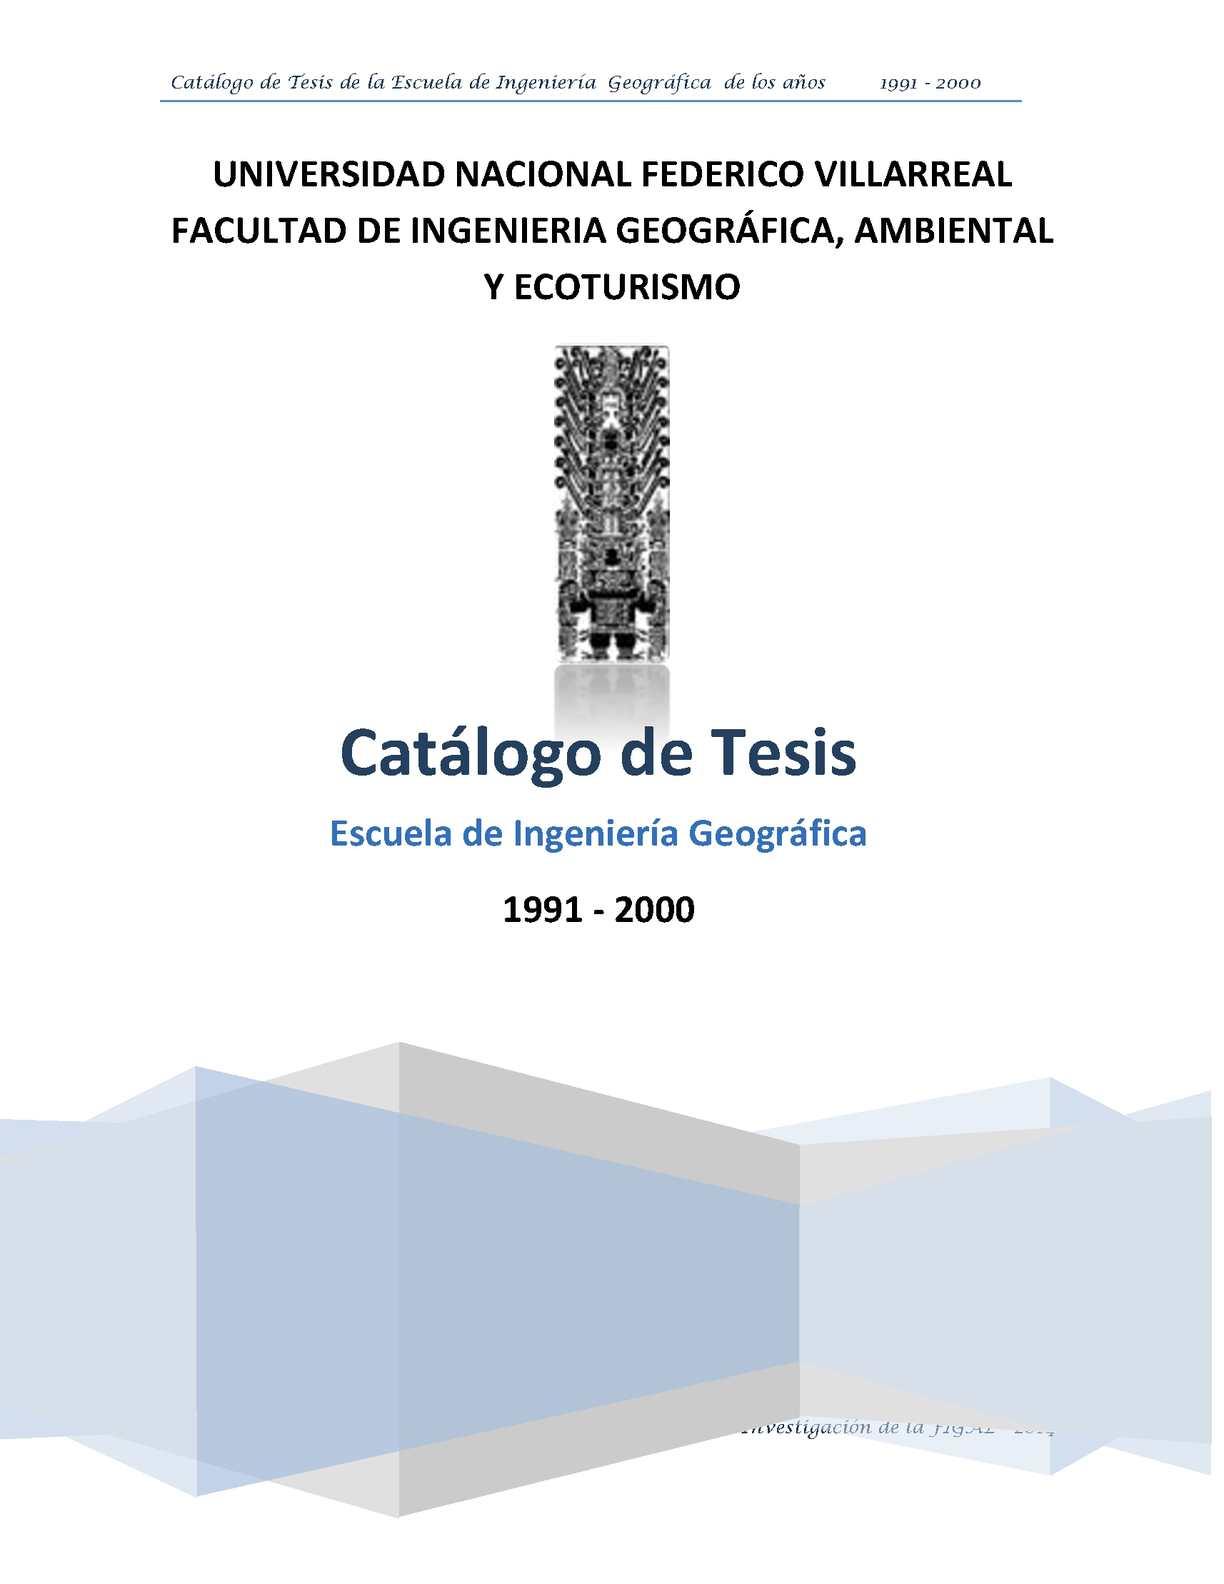 Tomo II Catálogo de Tesis 1991 2000 Ing. Geografica